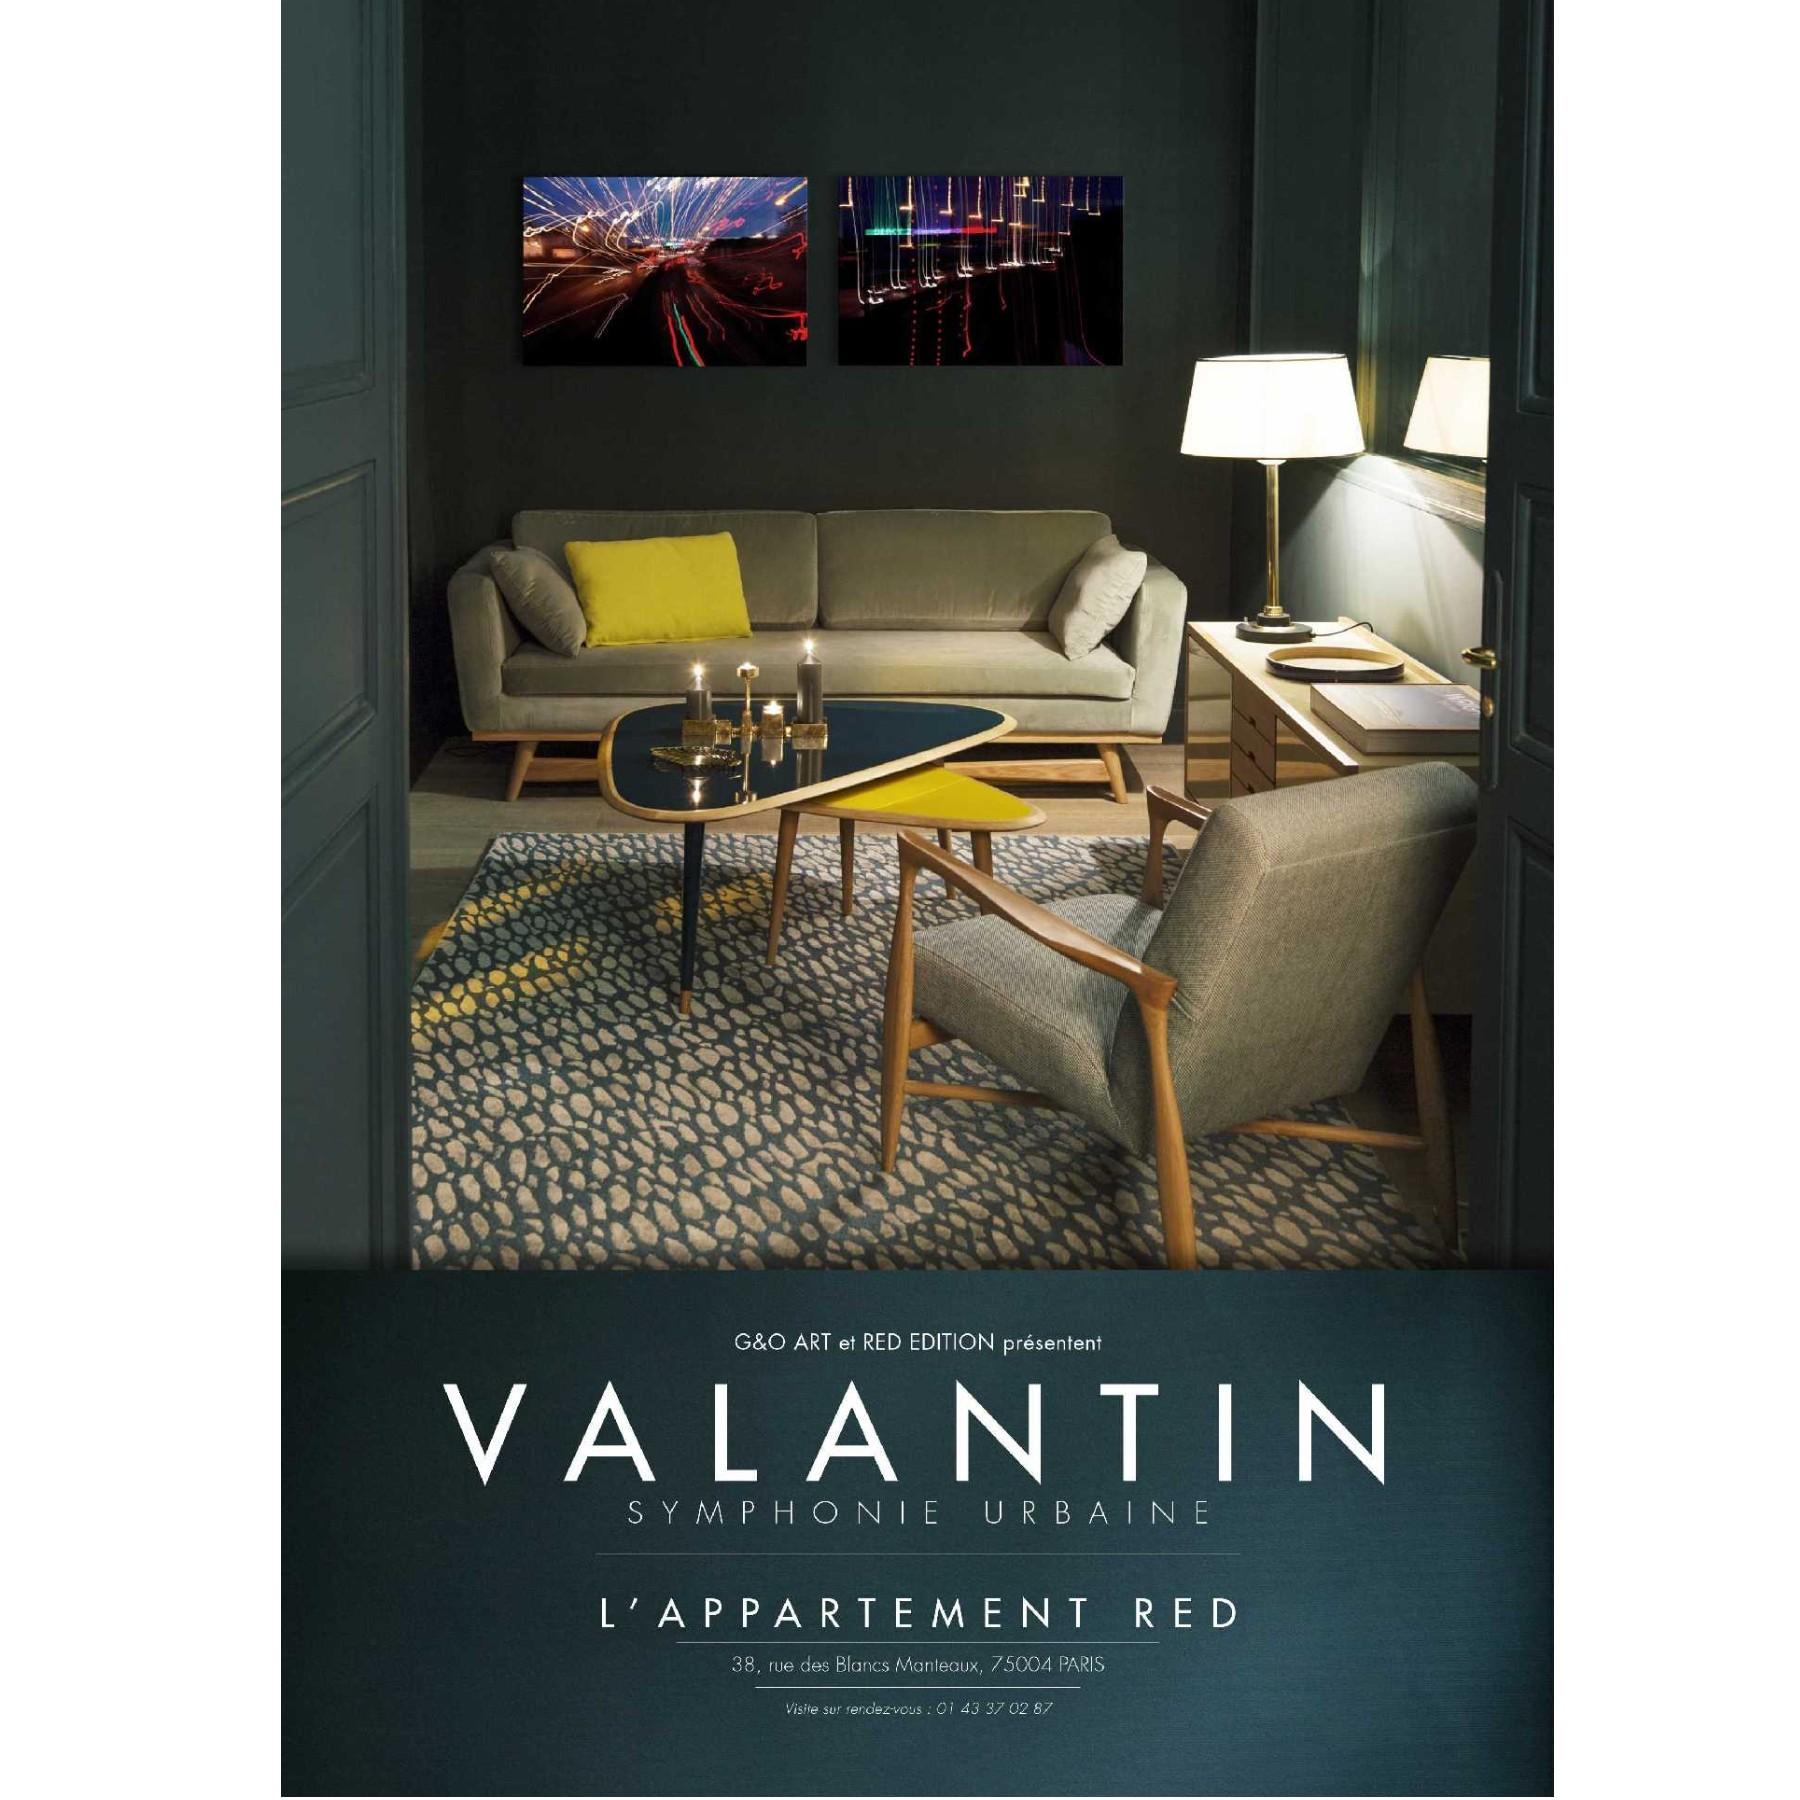 Valantin at Red Edition